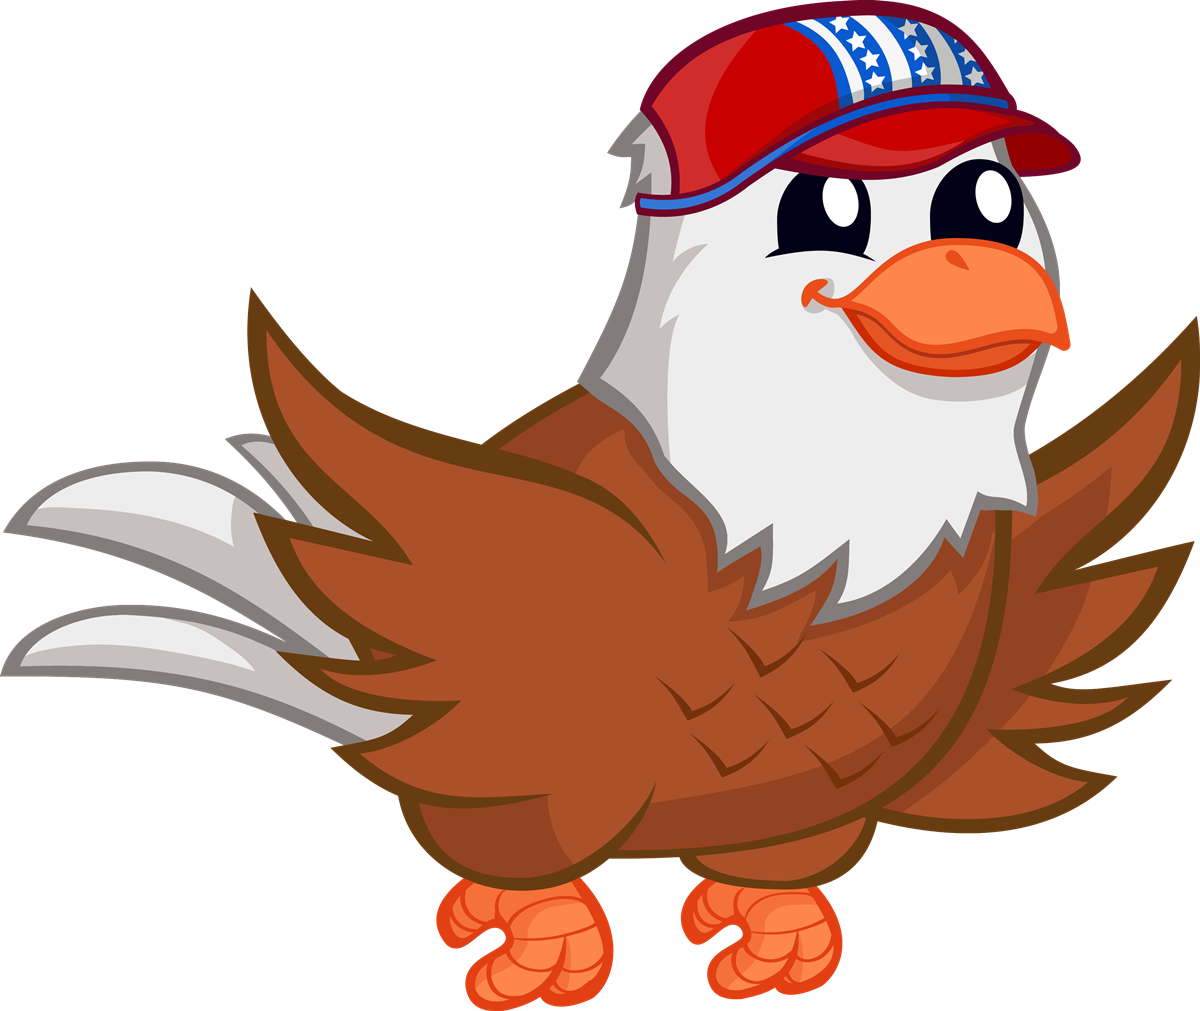 Ostrich clipart public domain. Cute eagle clip art